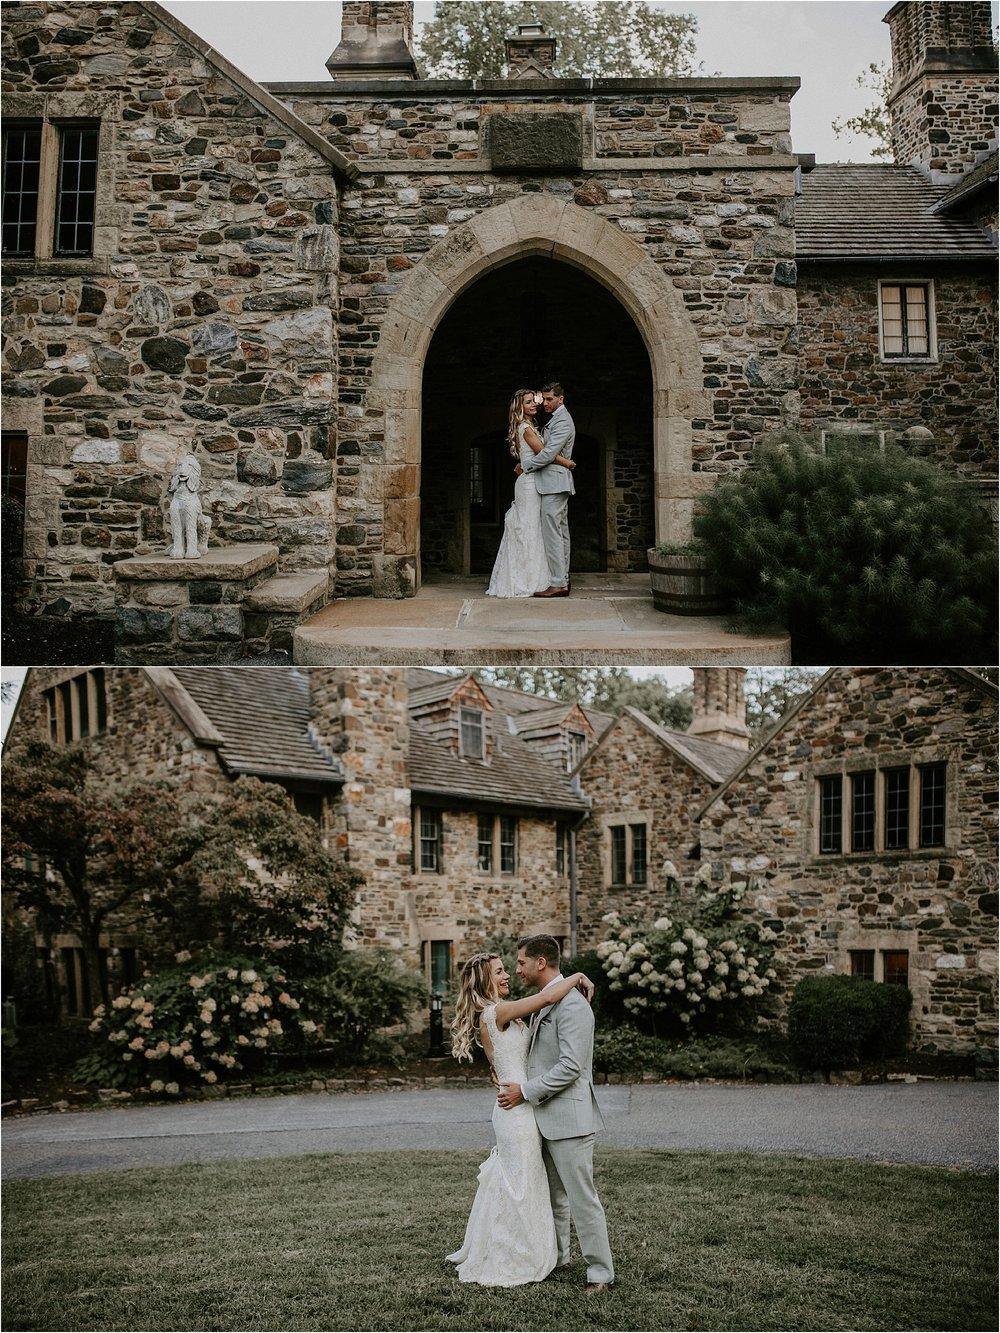 Sarah_Brookhart_Philadelphia_Wedding_Photographer_0061.jpg